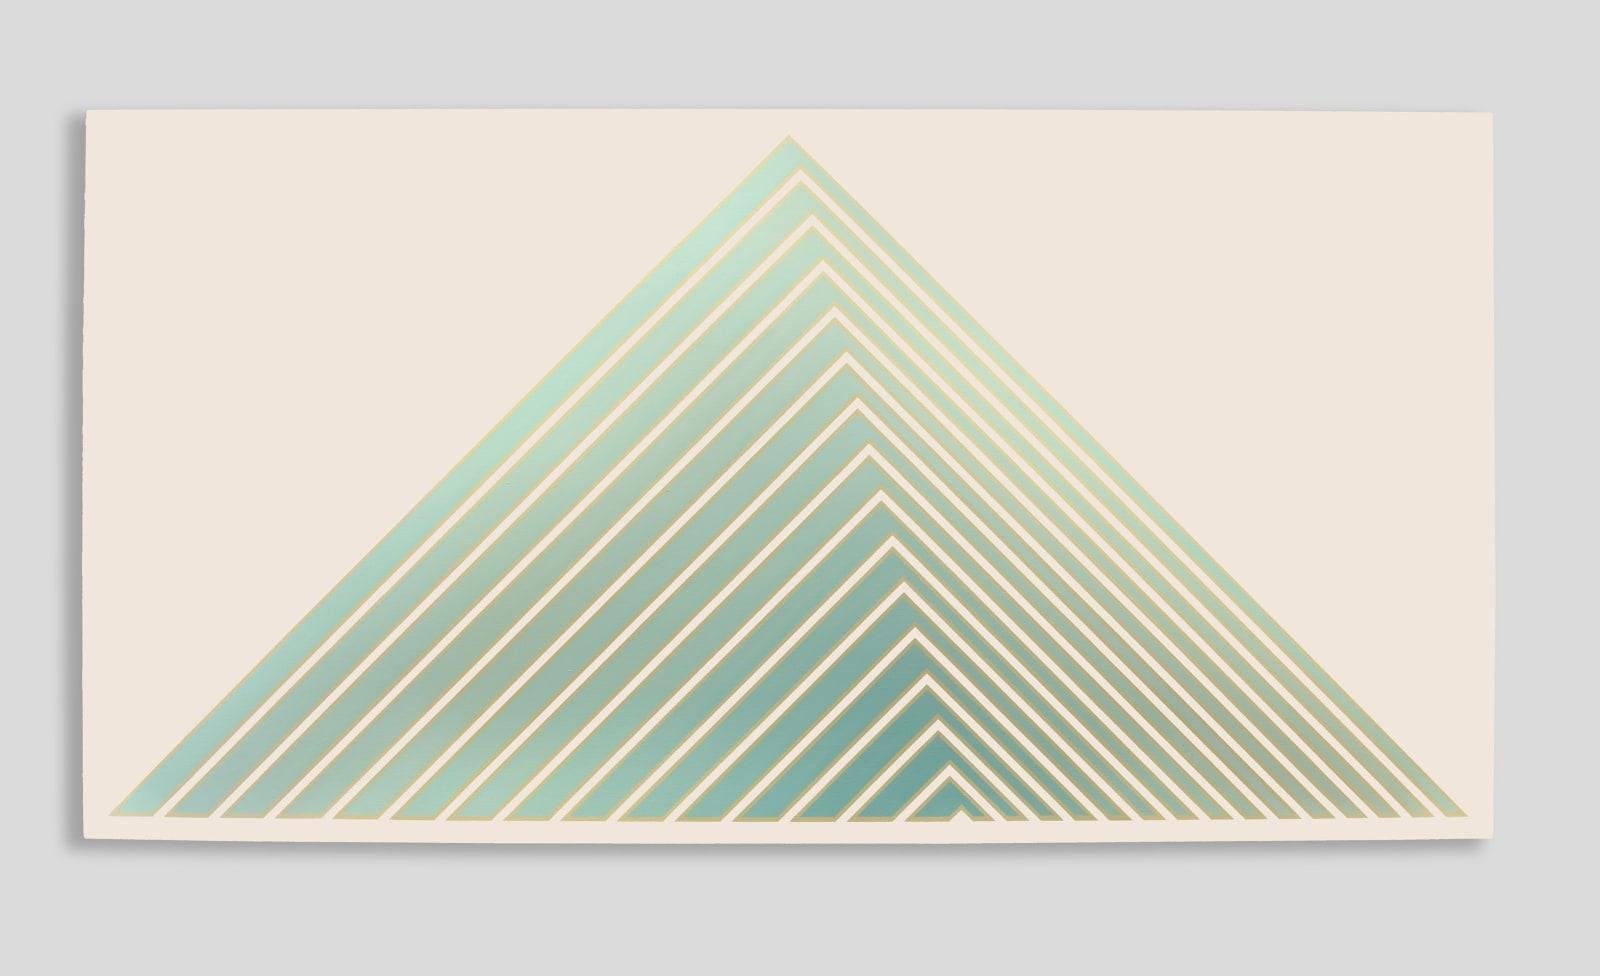 Tess Jaray, Green Pyramid, 1987